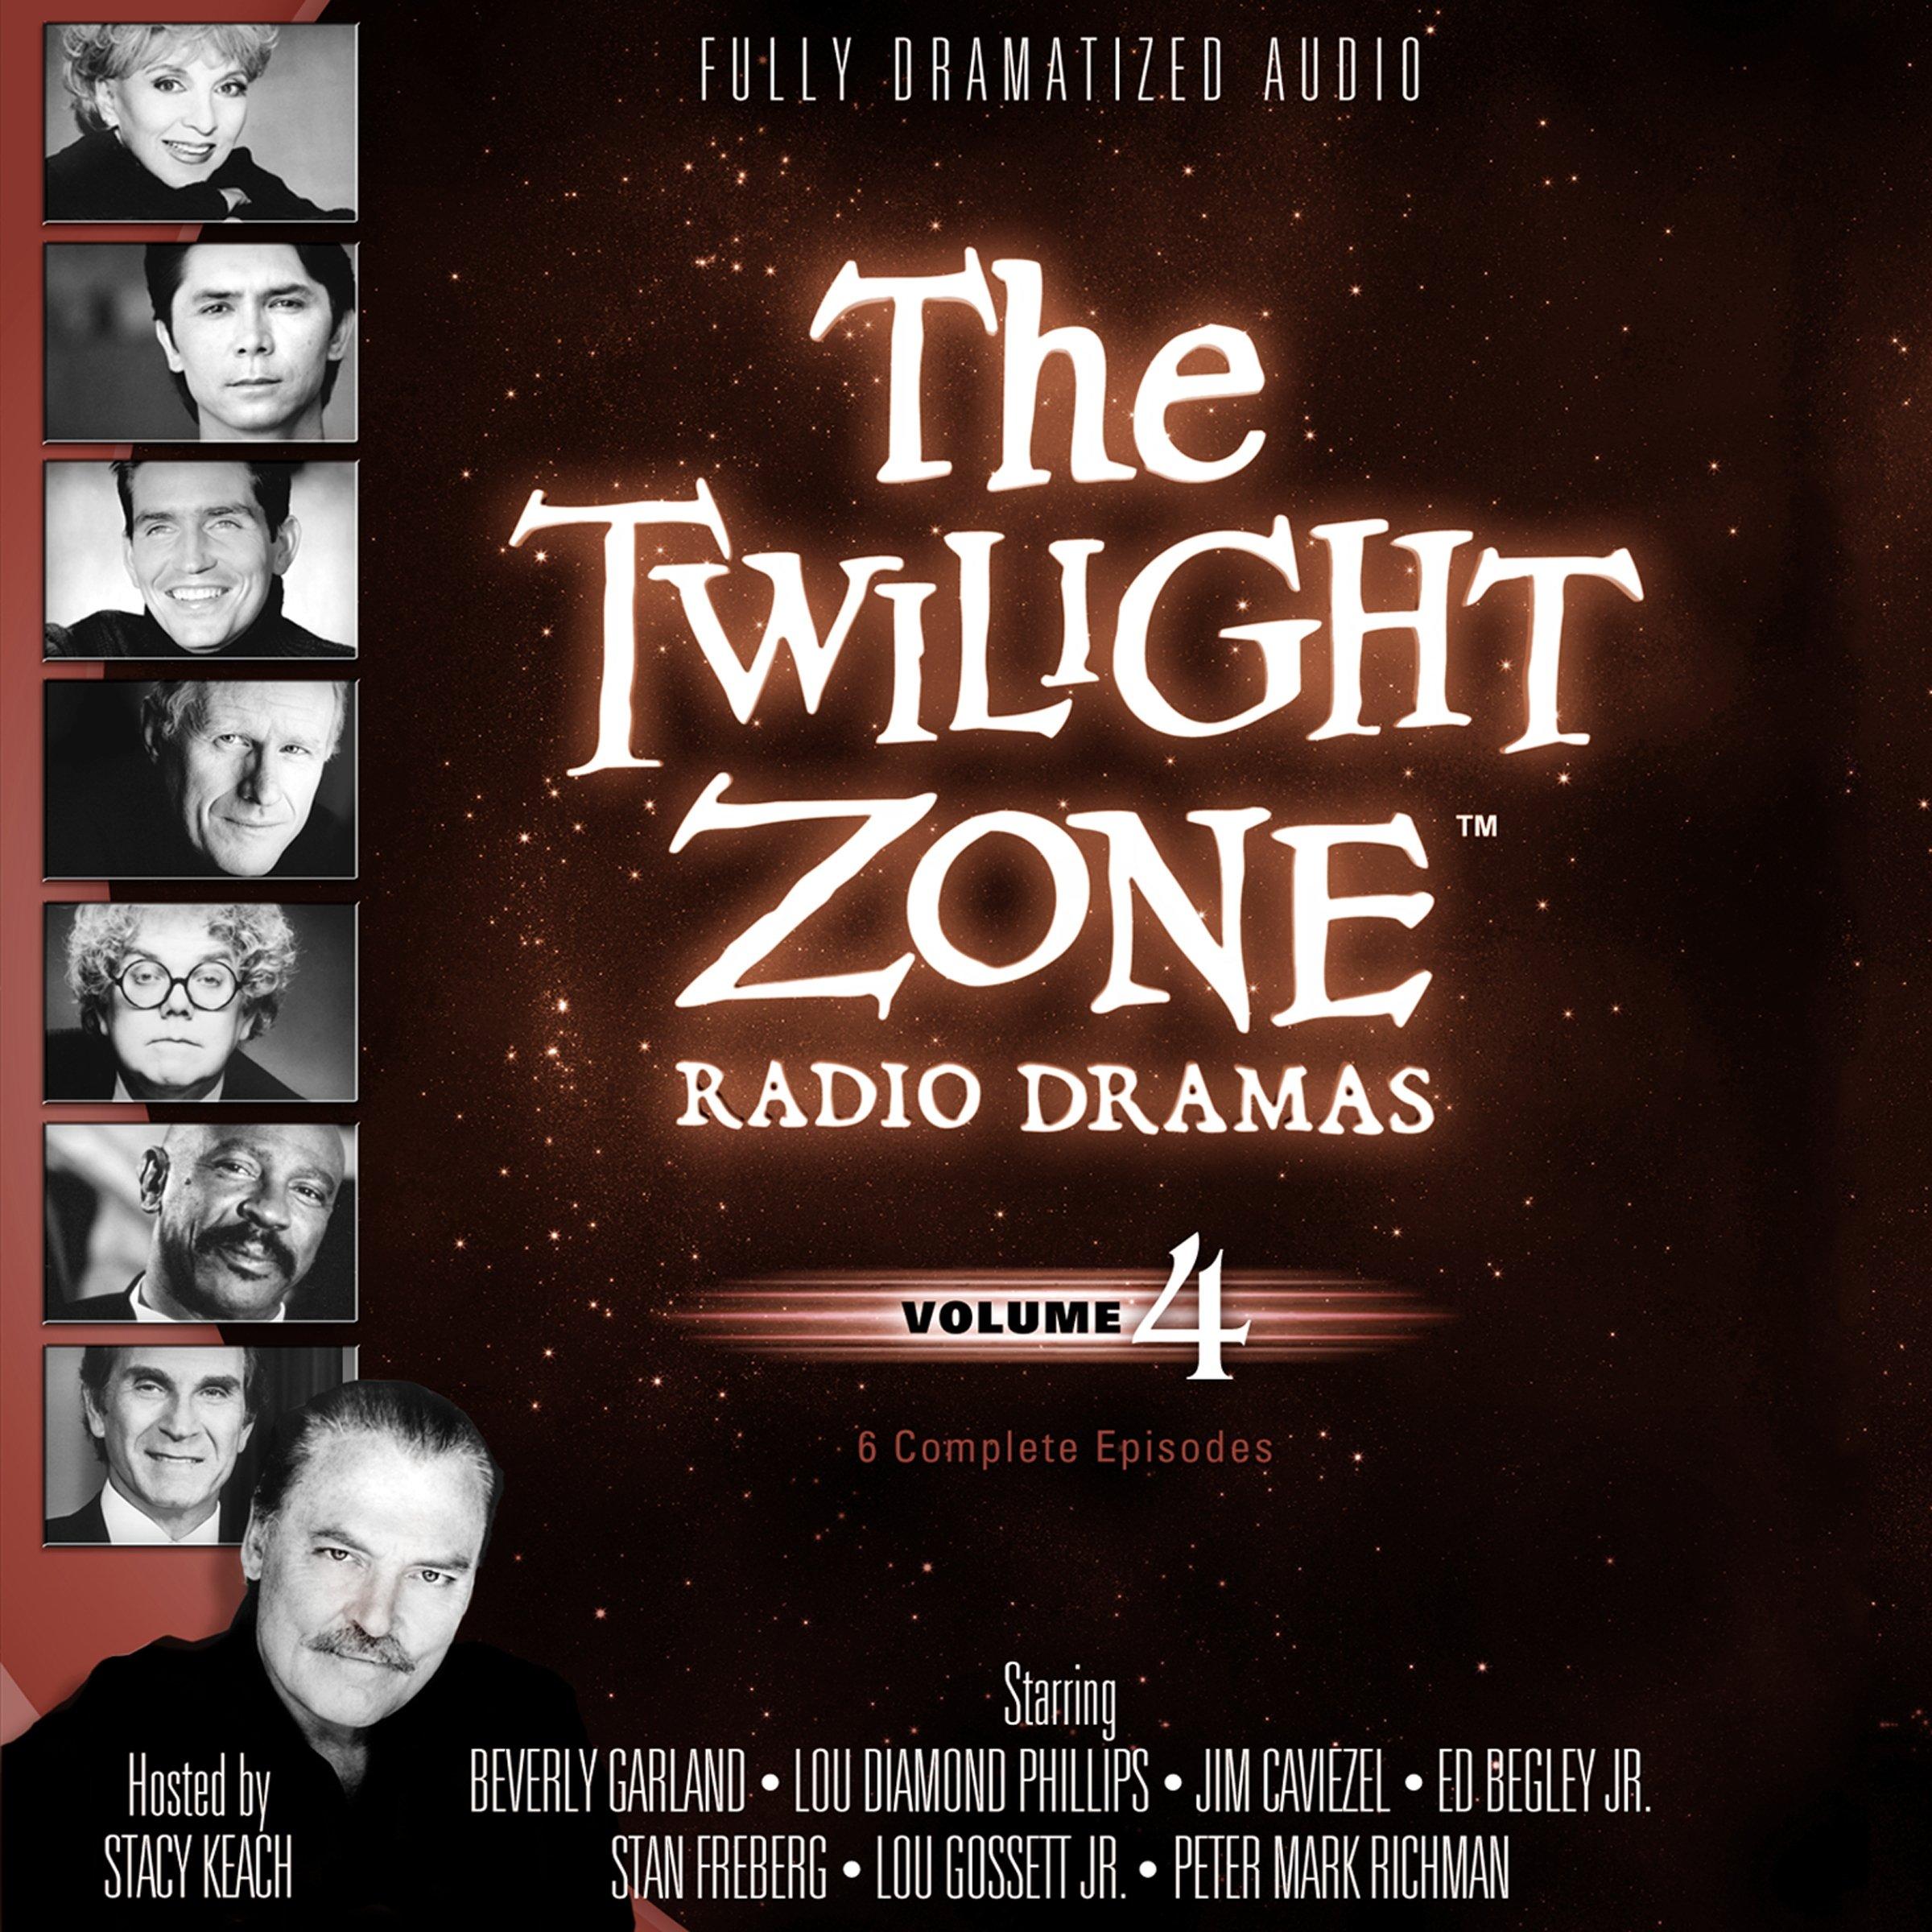 twilight zone radio dramas vol4